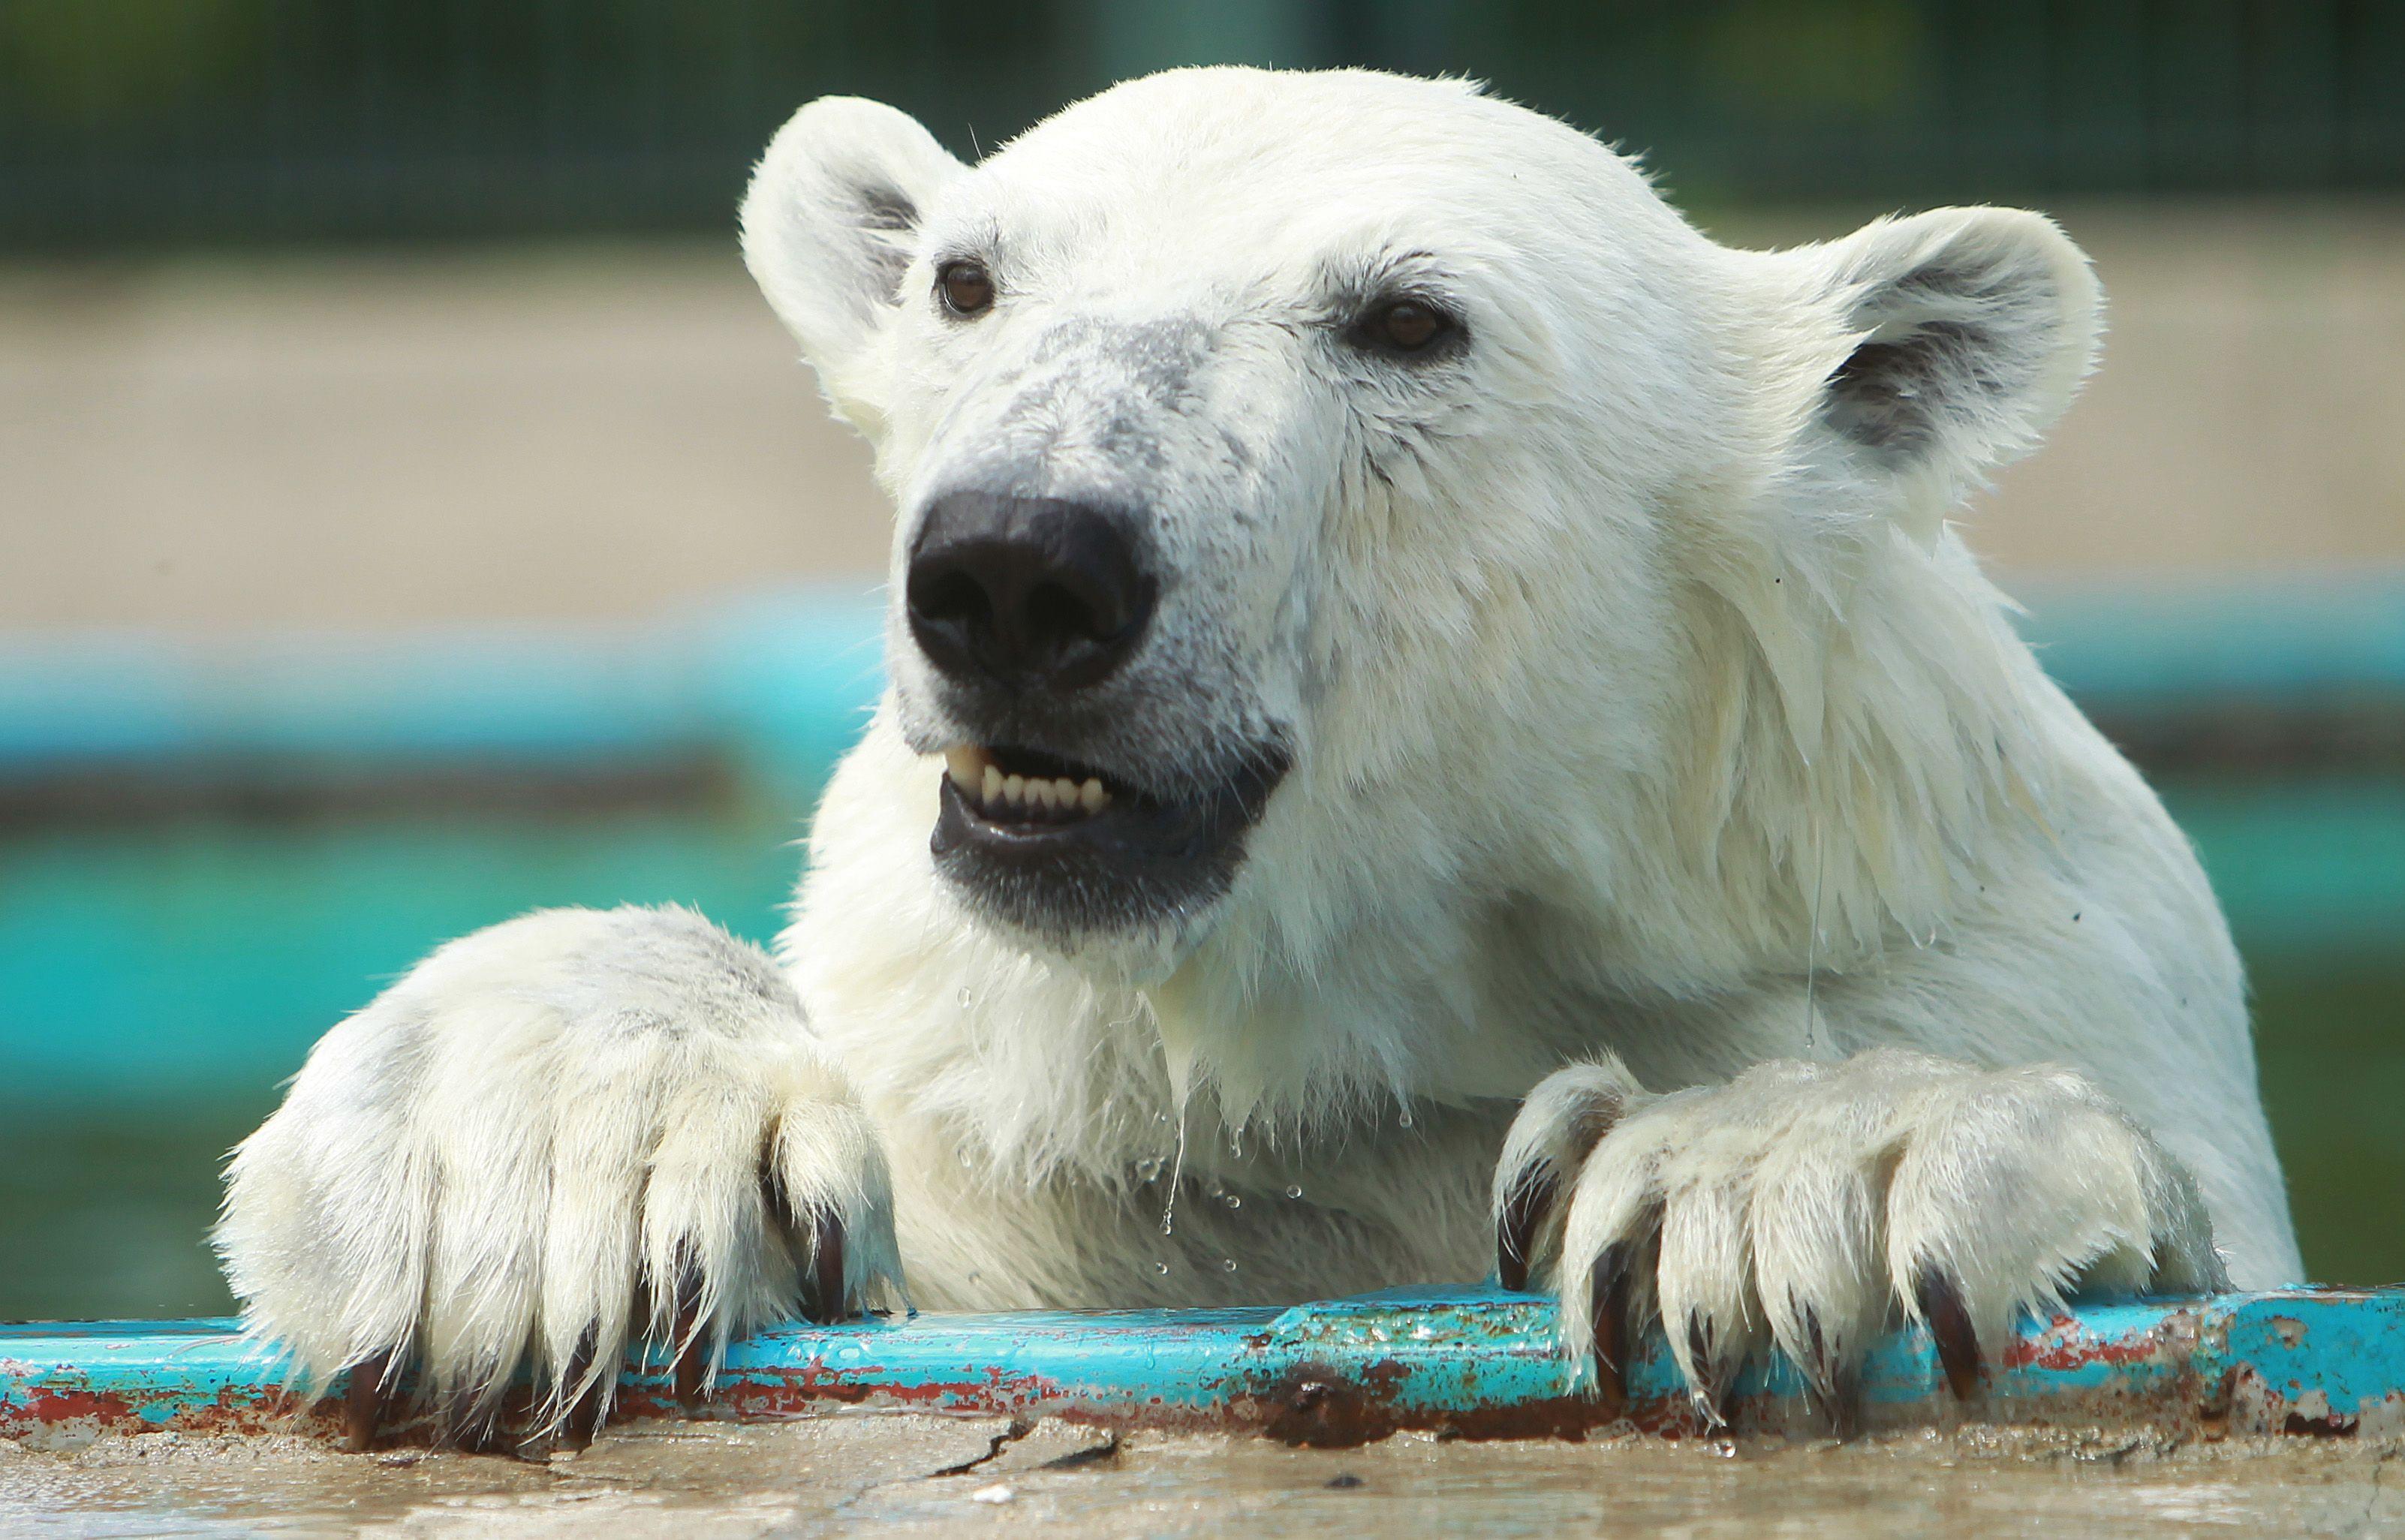 В жаркие дни сотрудники усиливают контроль за самочувствием животных. Фото: Наталия Нечаева